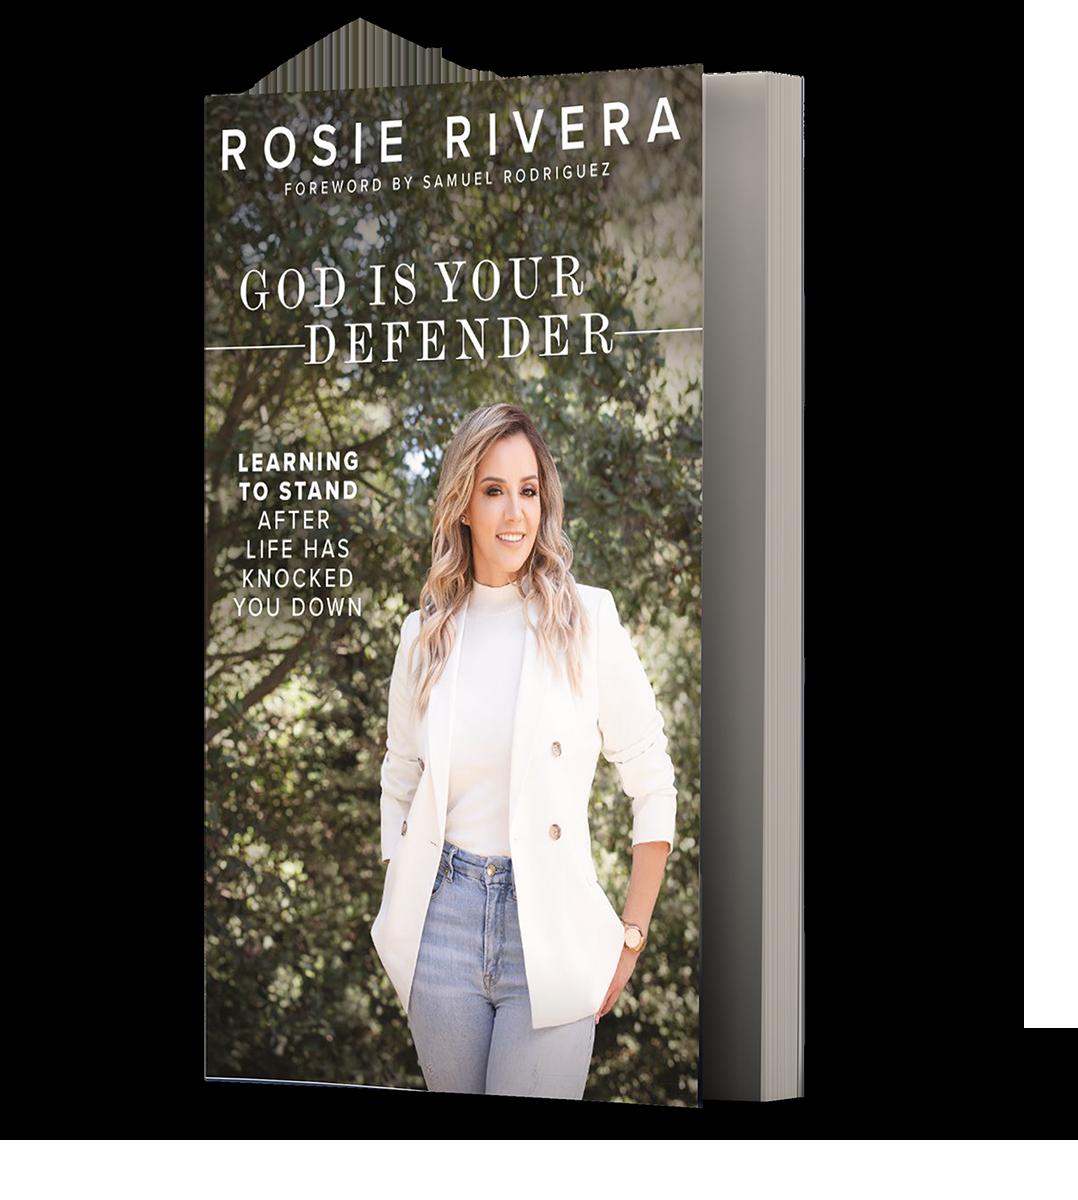 god is your defender rosie rivera